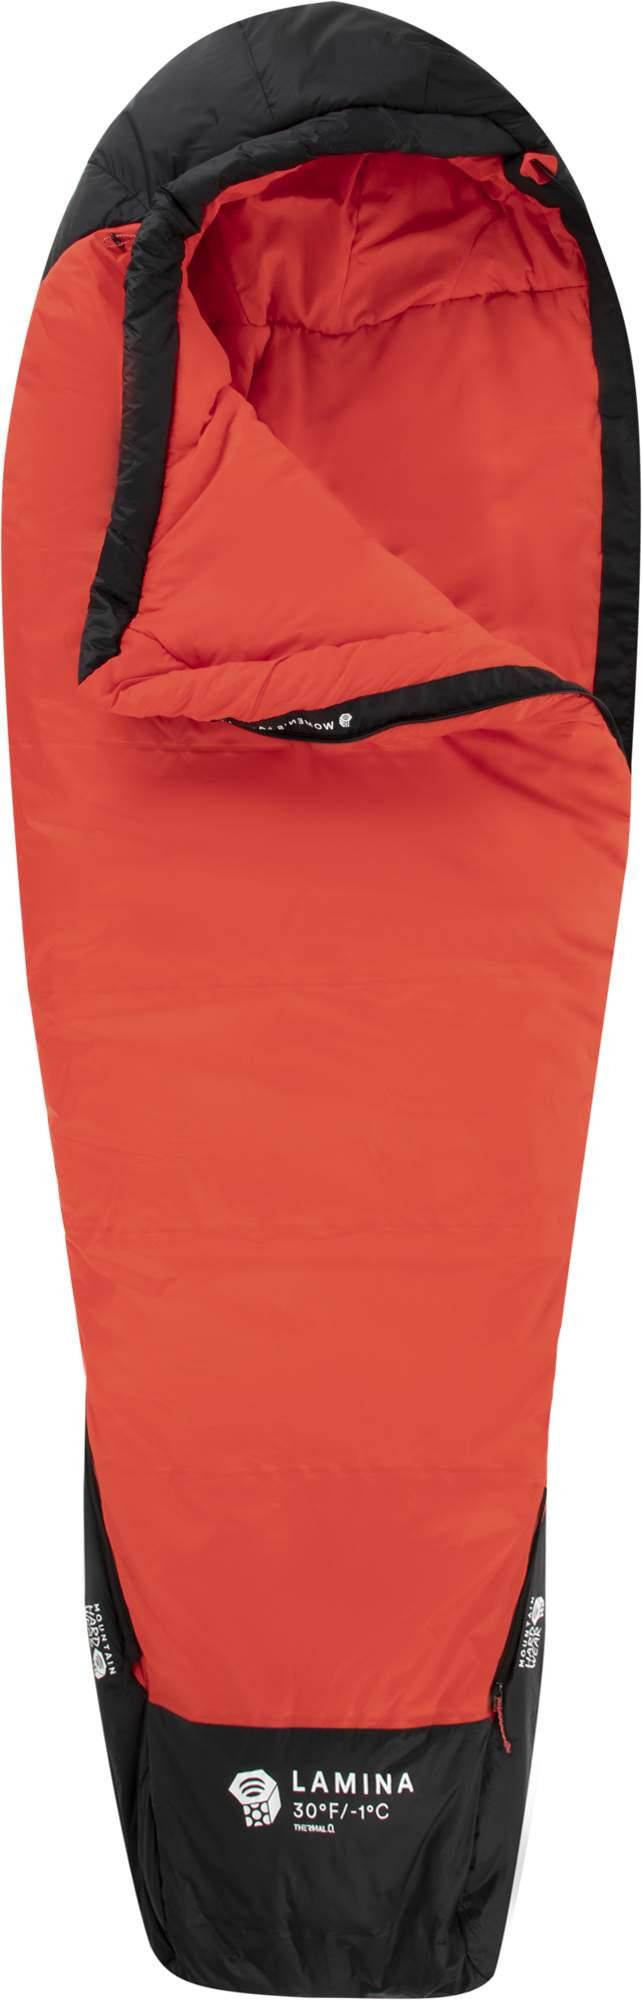 Mountain Hardwear Спальный мешок женский Mountain Hardwear Lamina -1 левосторонний спальный мешок atemi dream